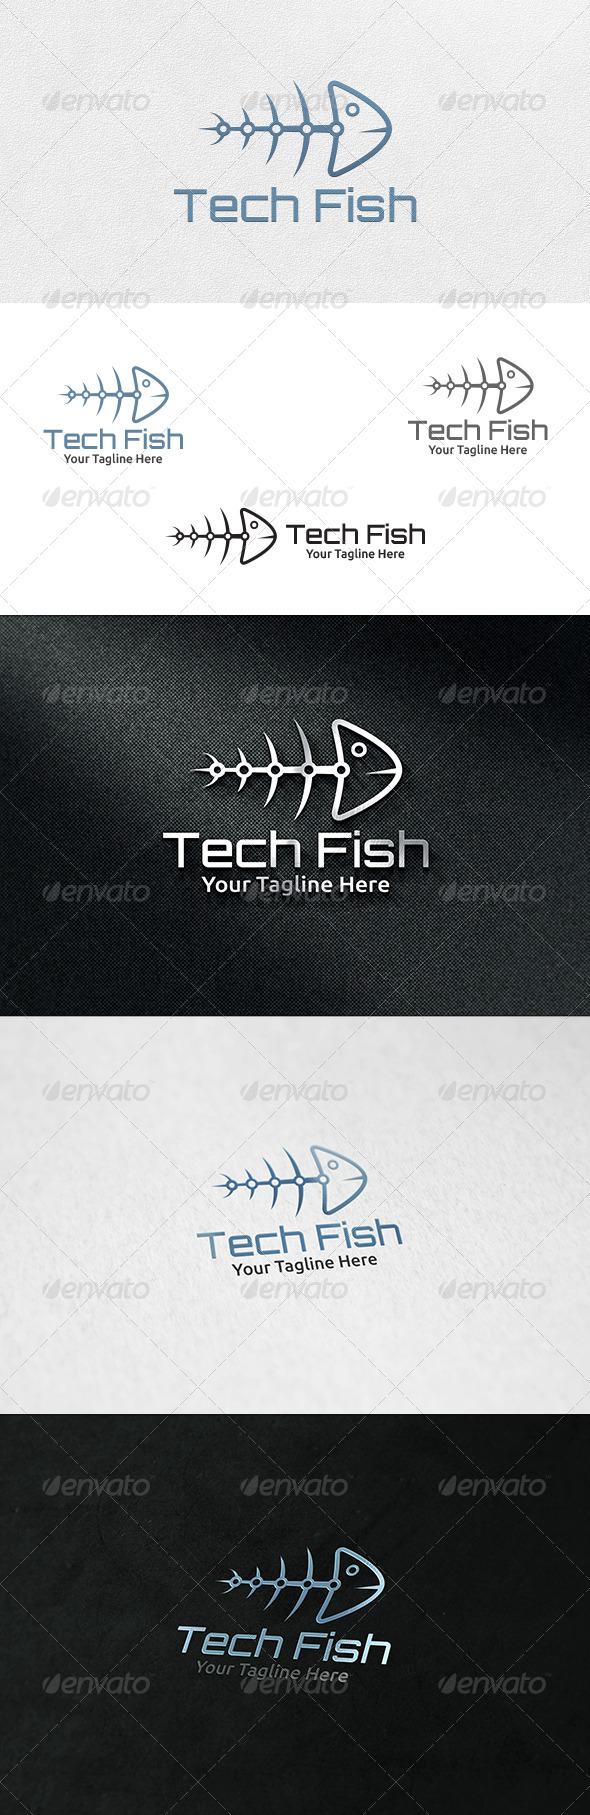 Tech Fish - Logo Template - Symbols Logo Templates